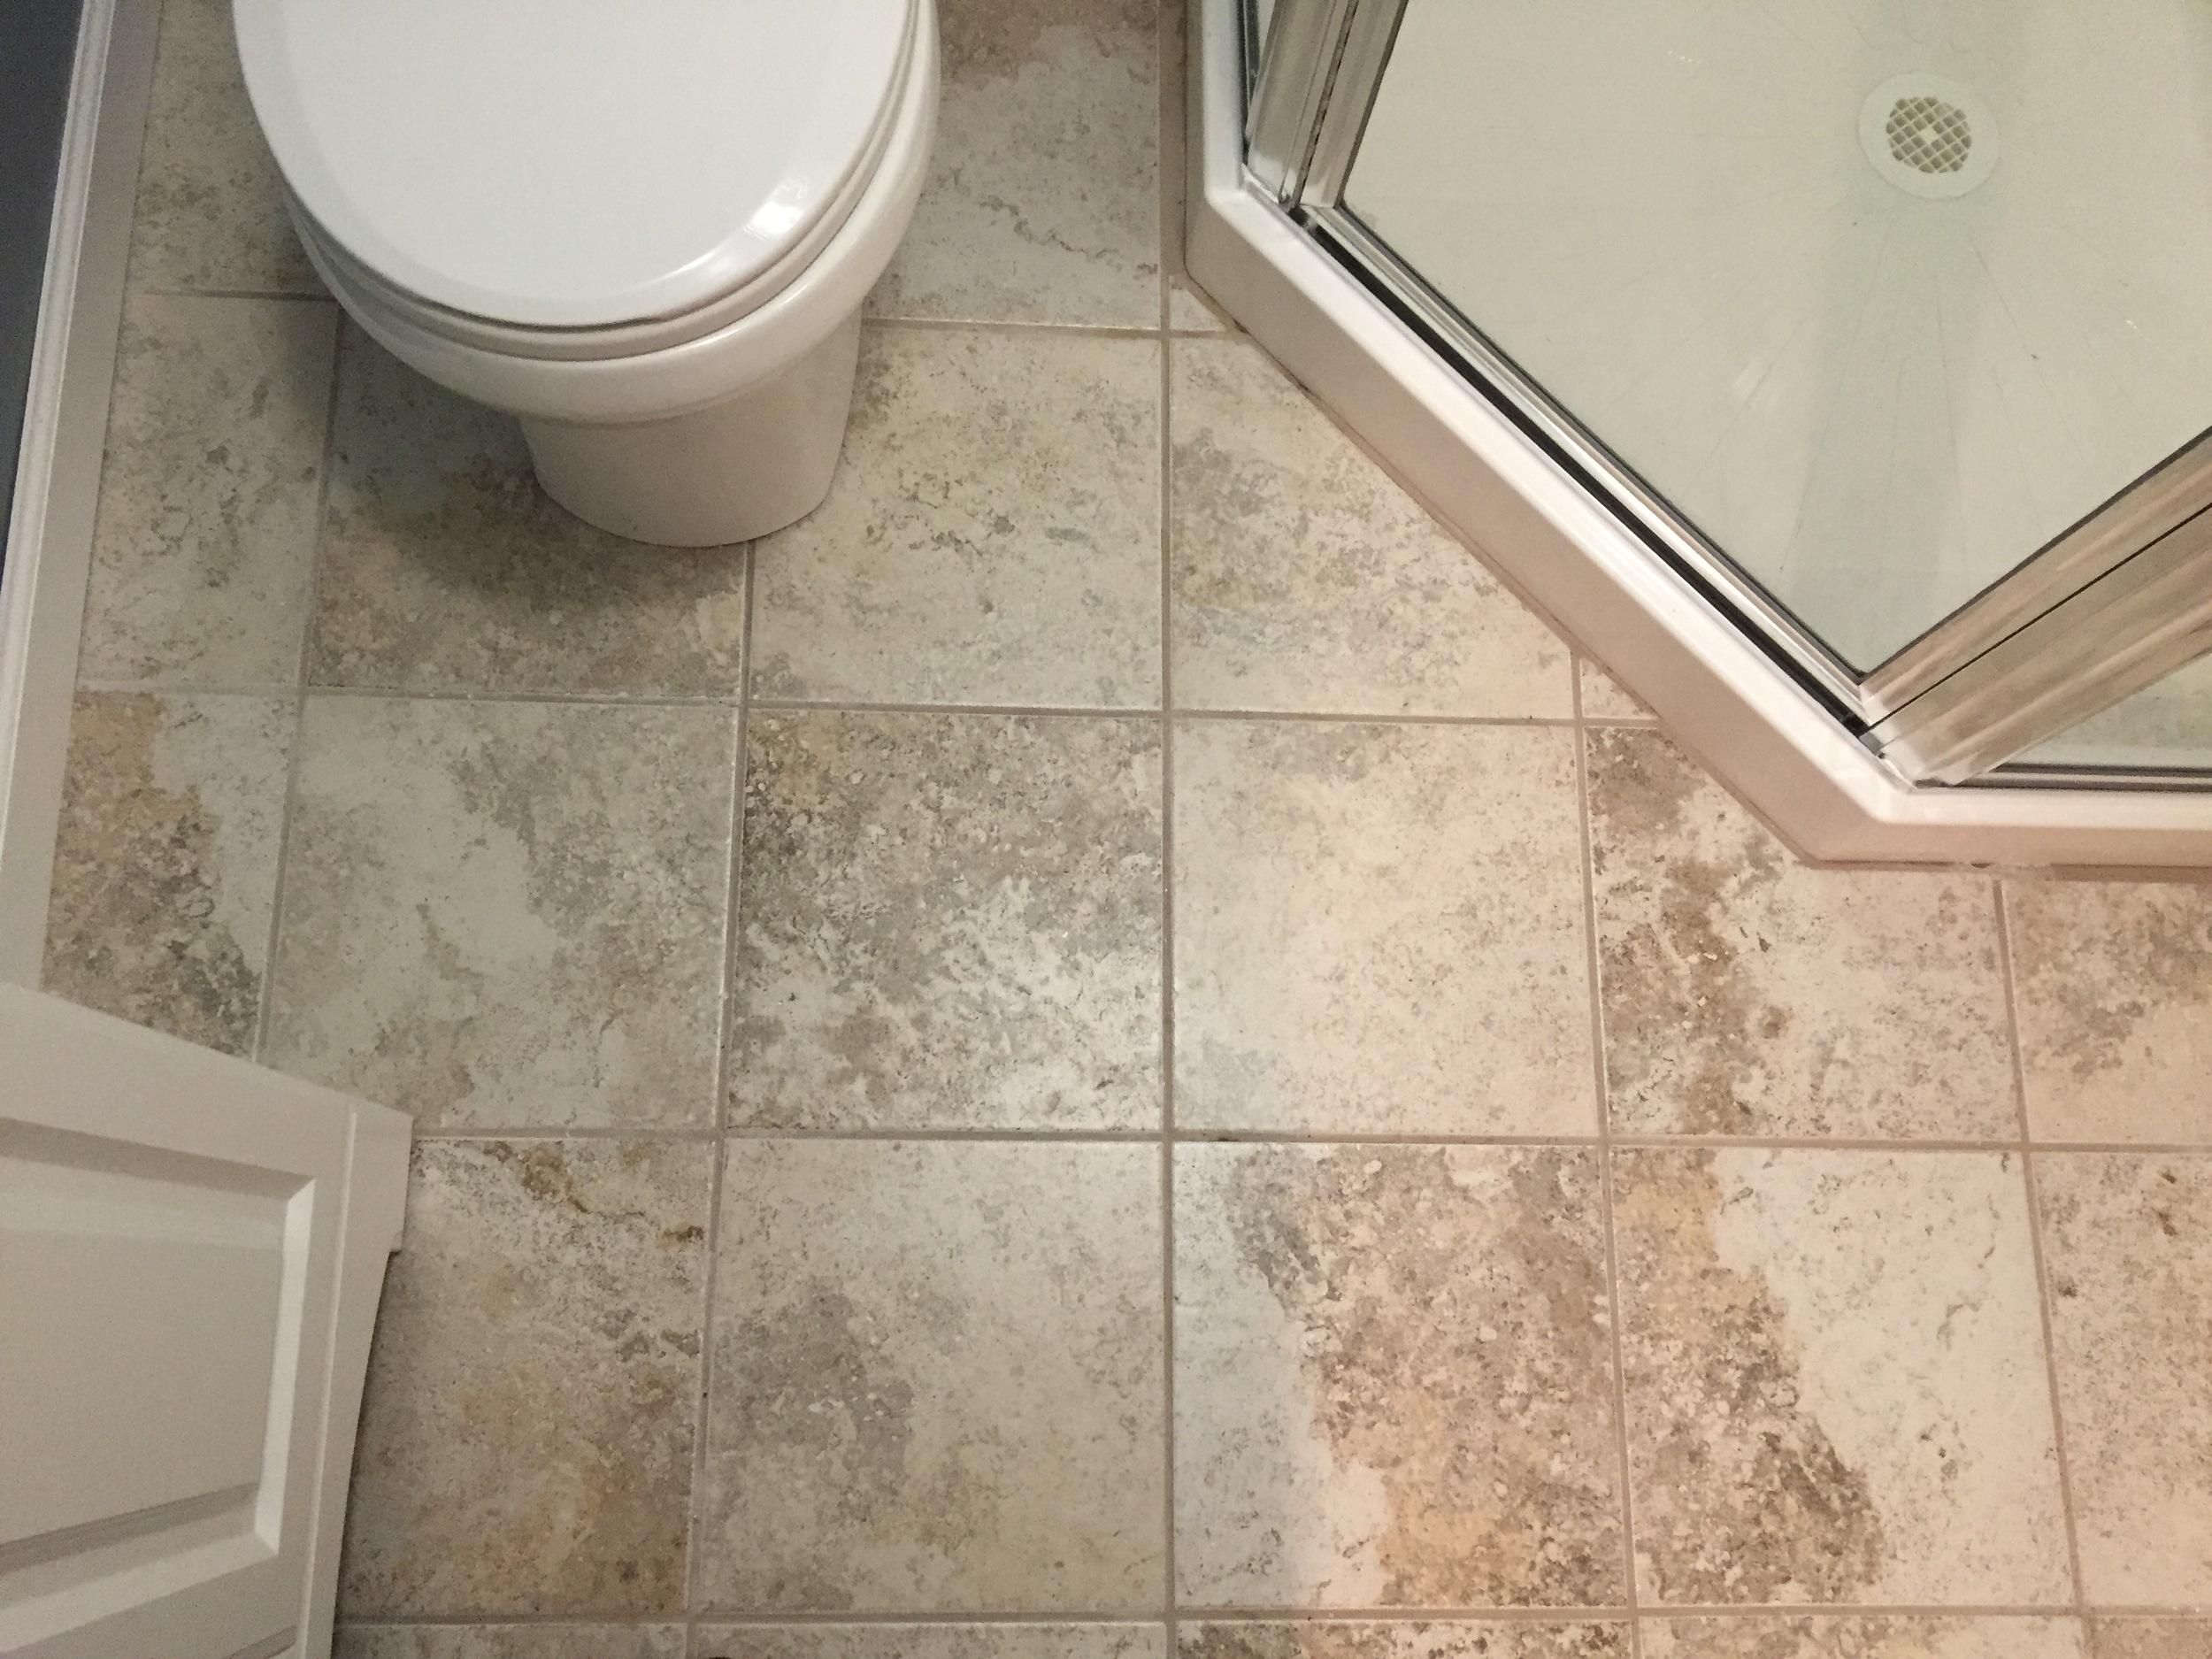 Apartment Bathroom Floor